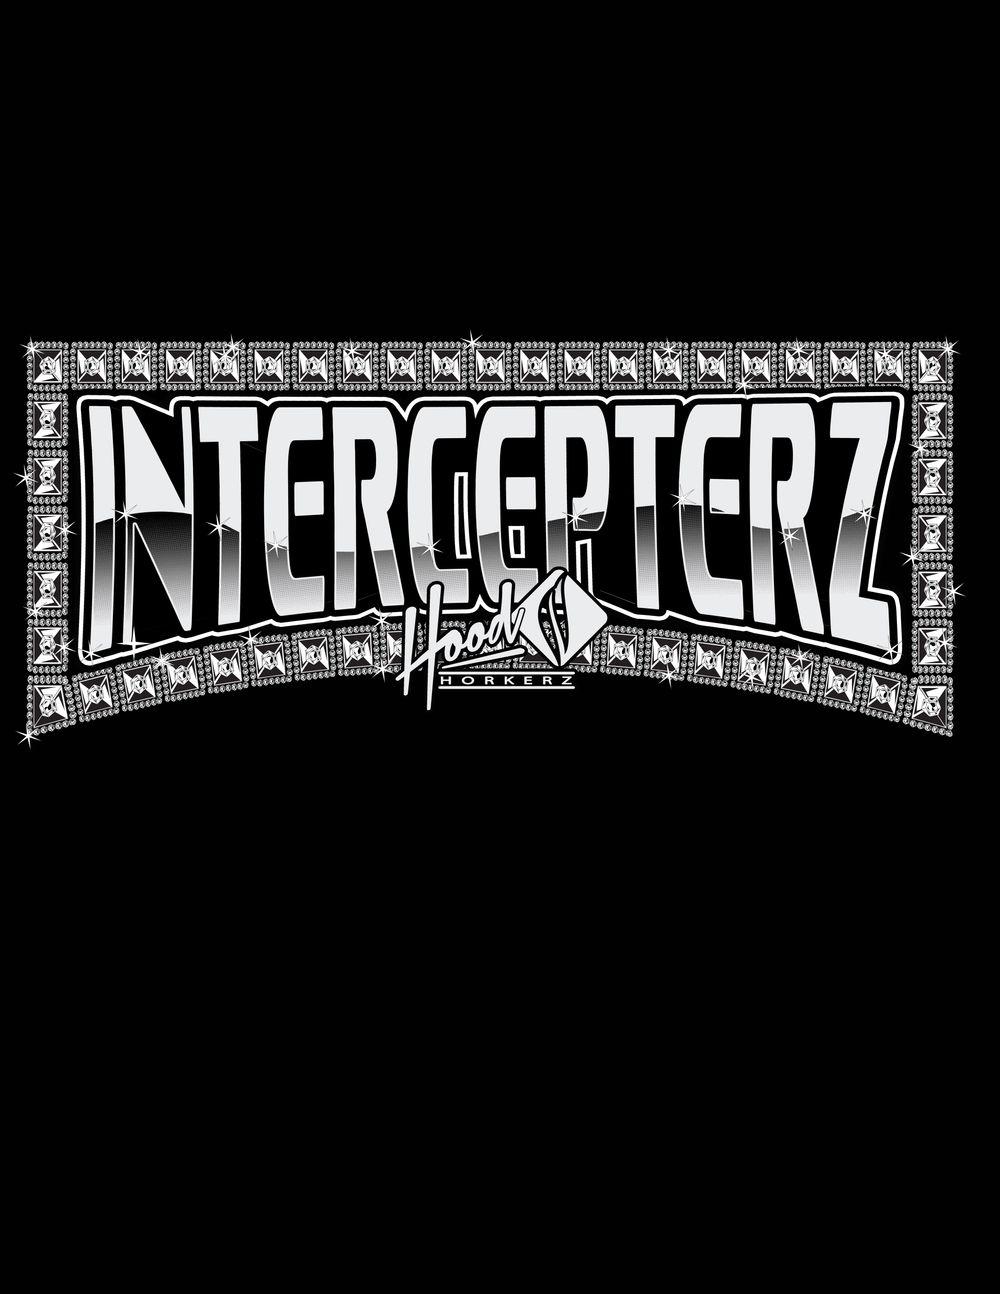 intercepterz.jpg